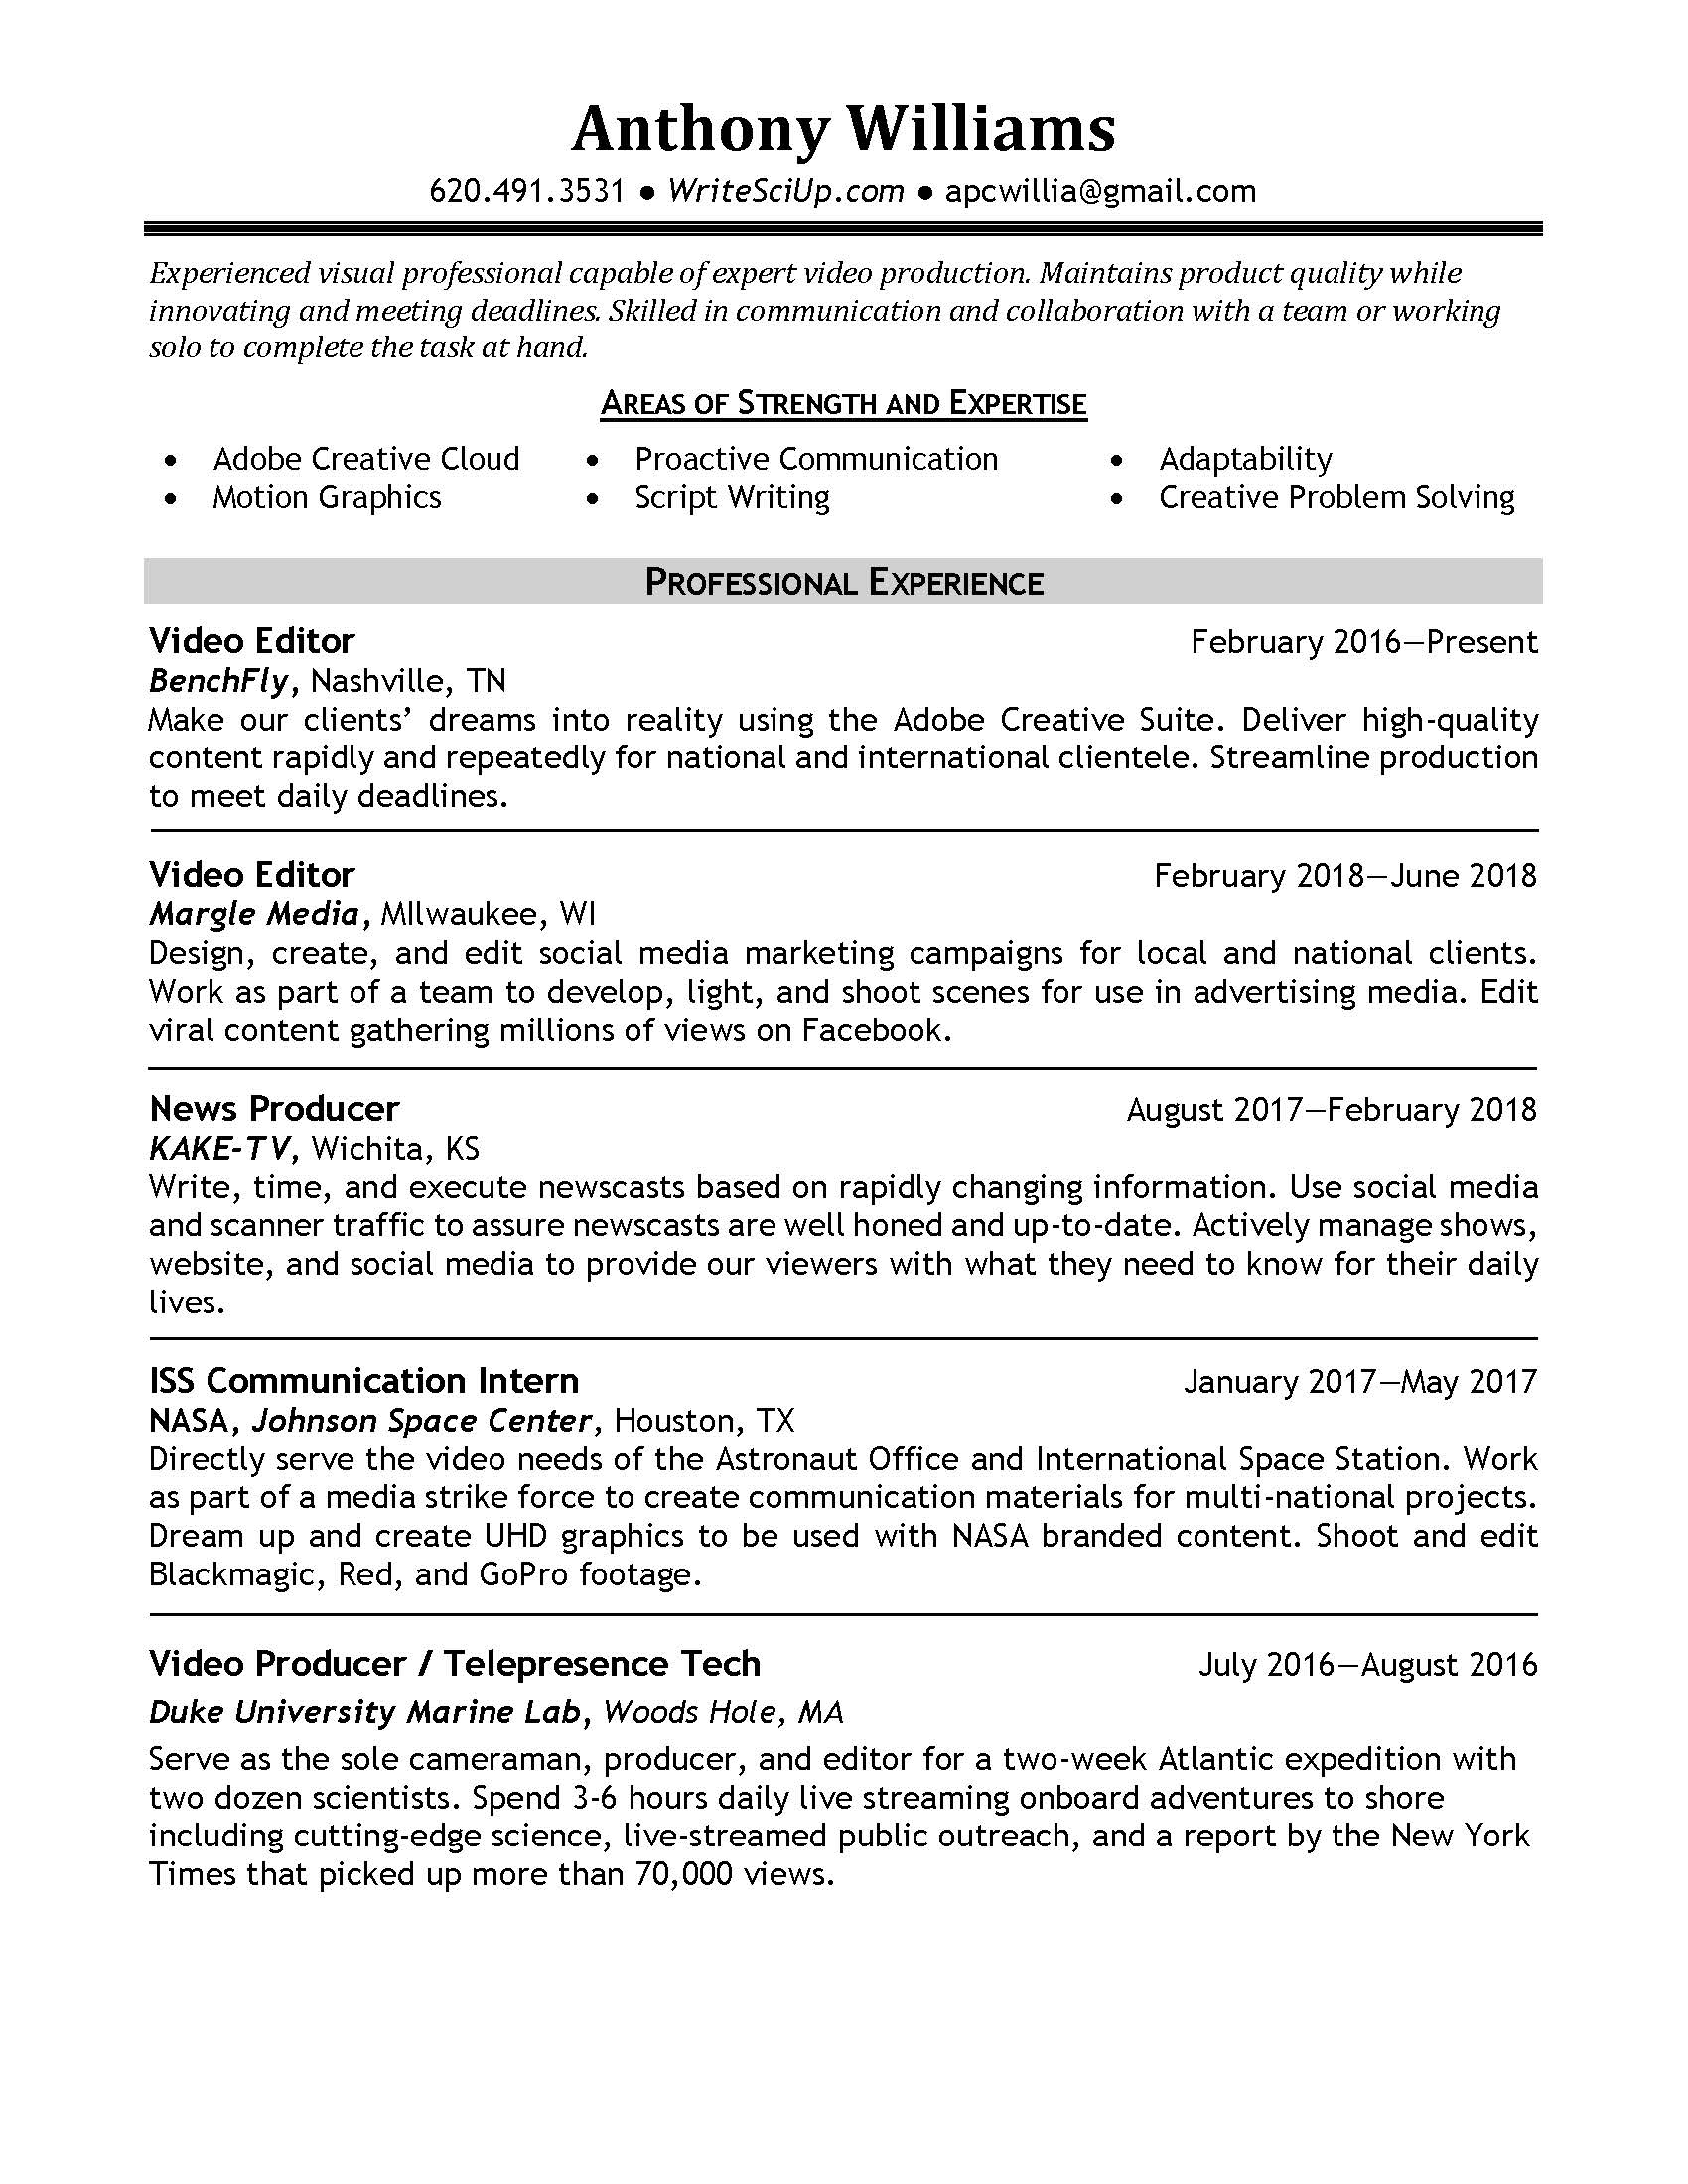 Resume – Anthony Williams